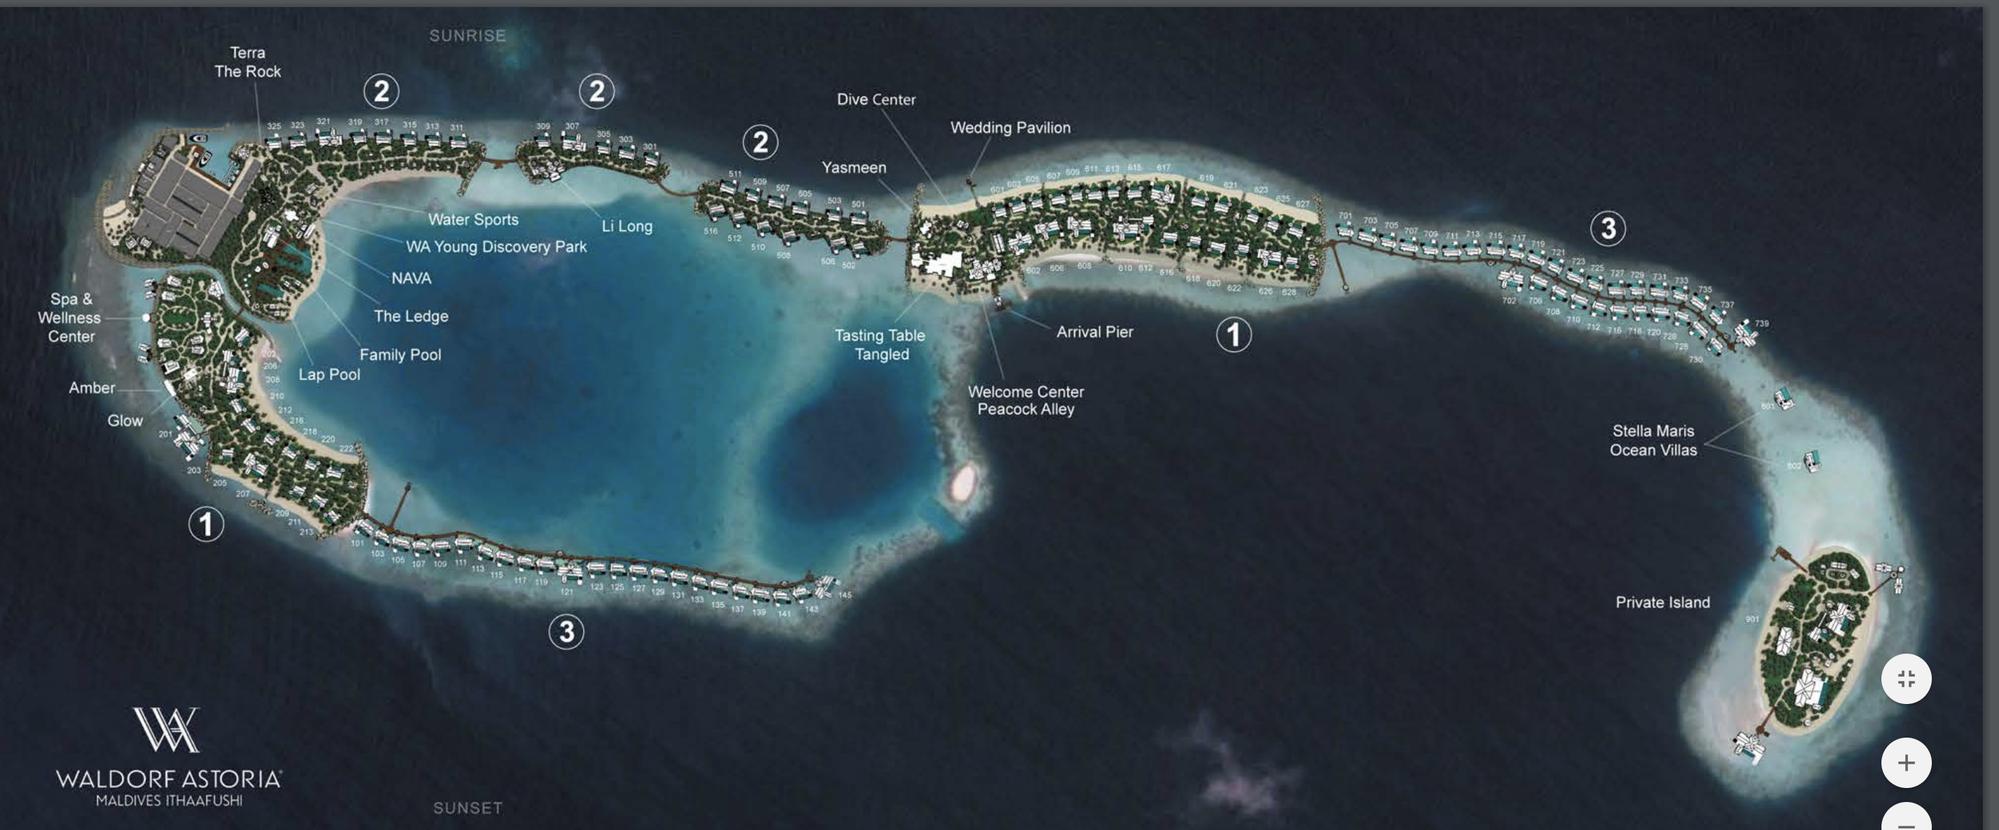 Waldorf Astoria Maldives Ithaafushi Page 55